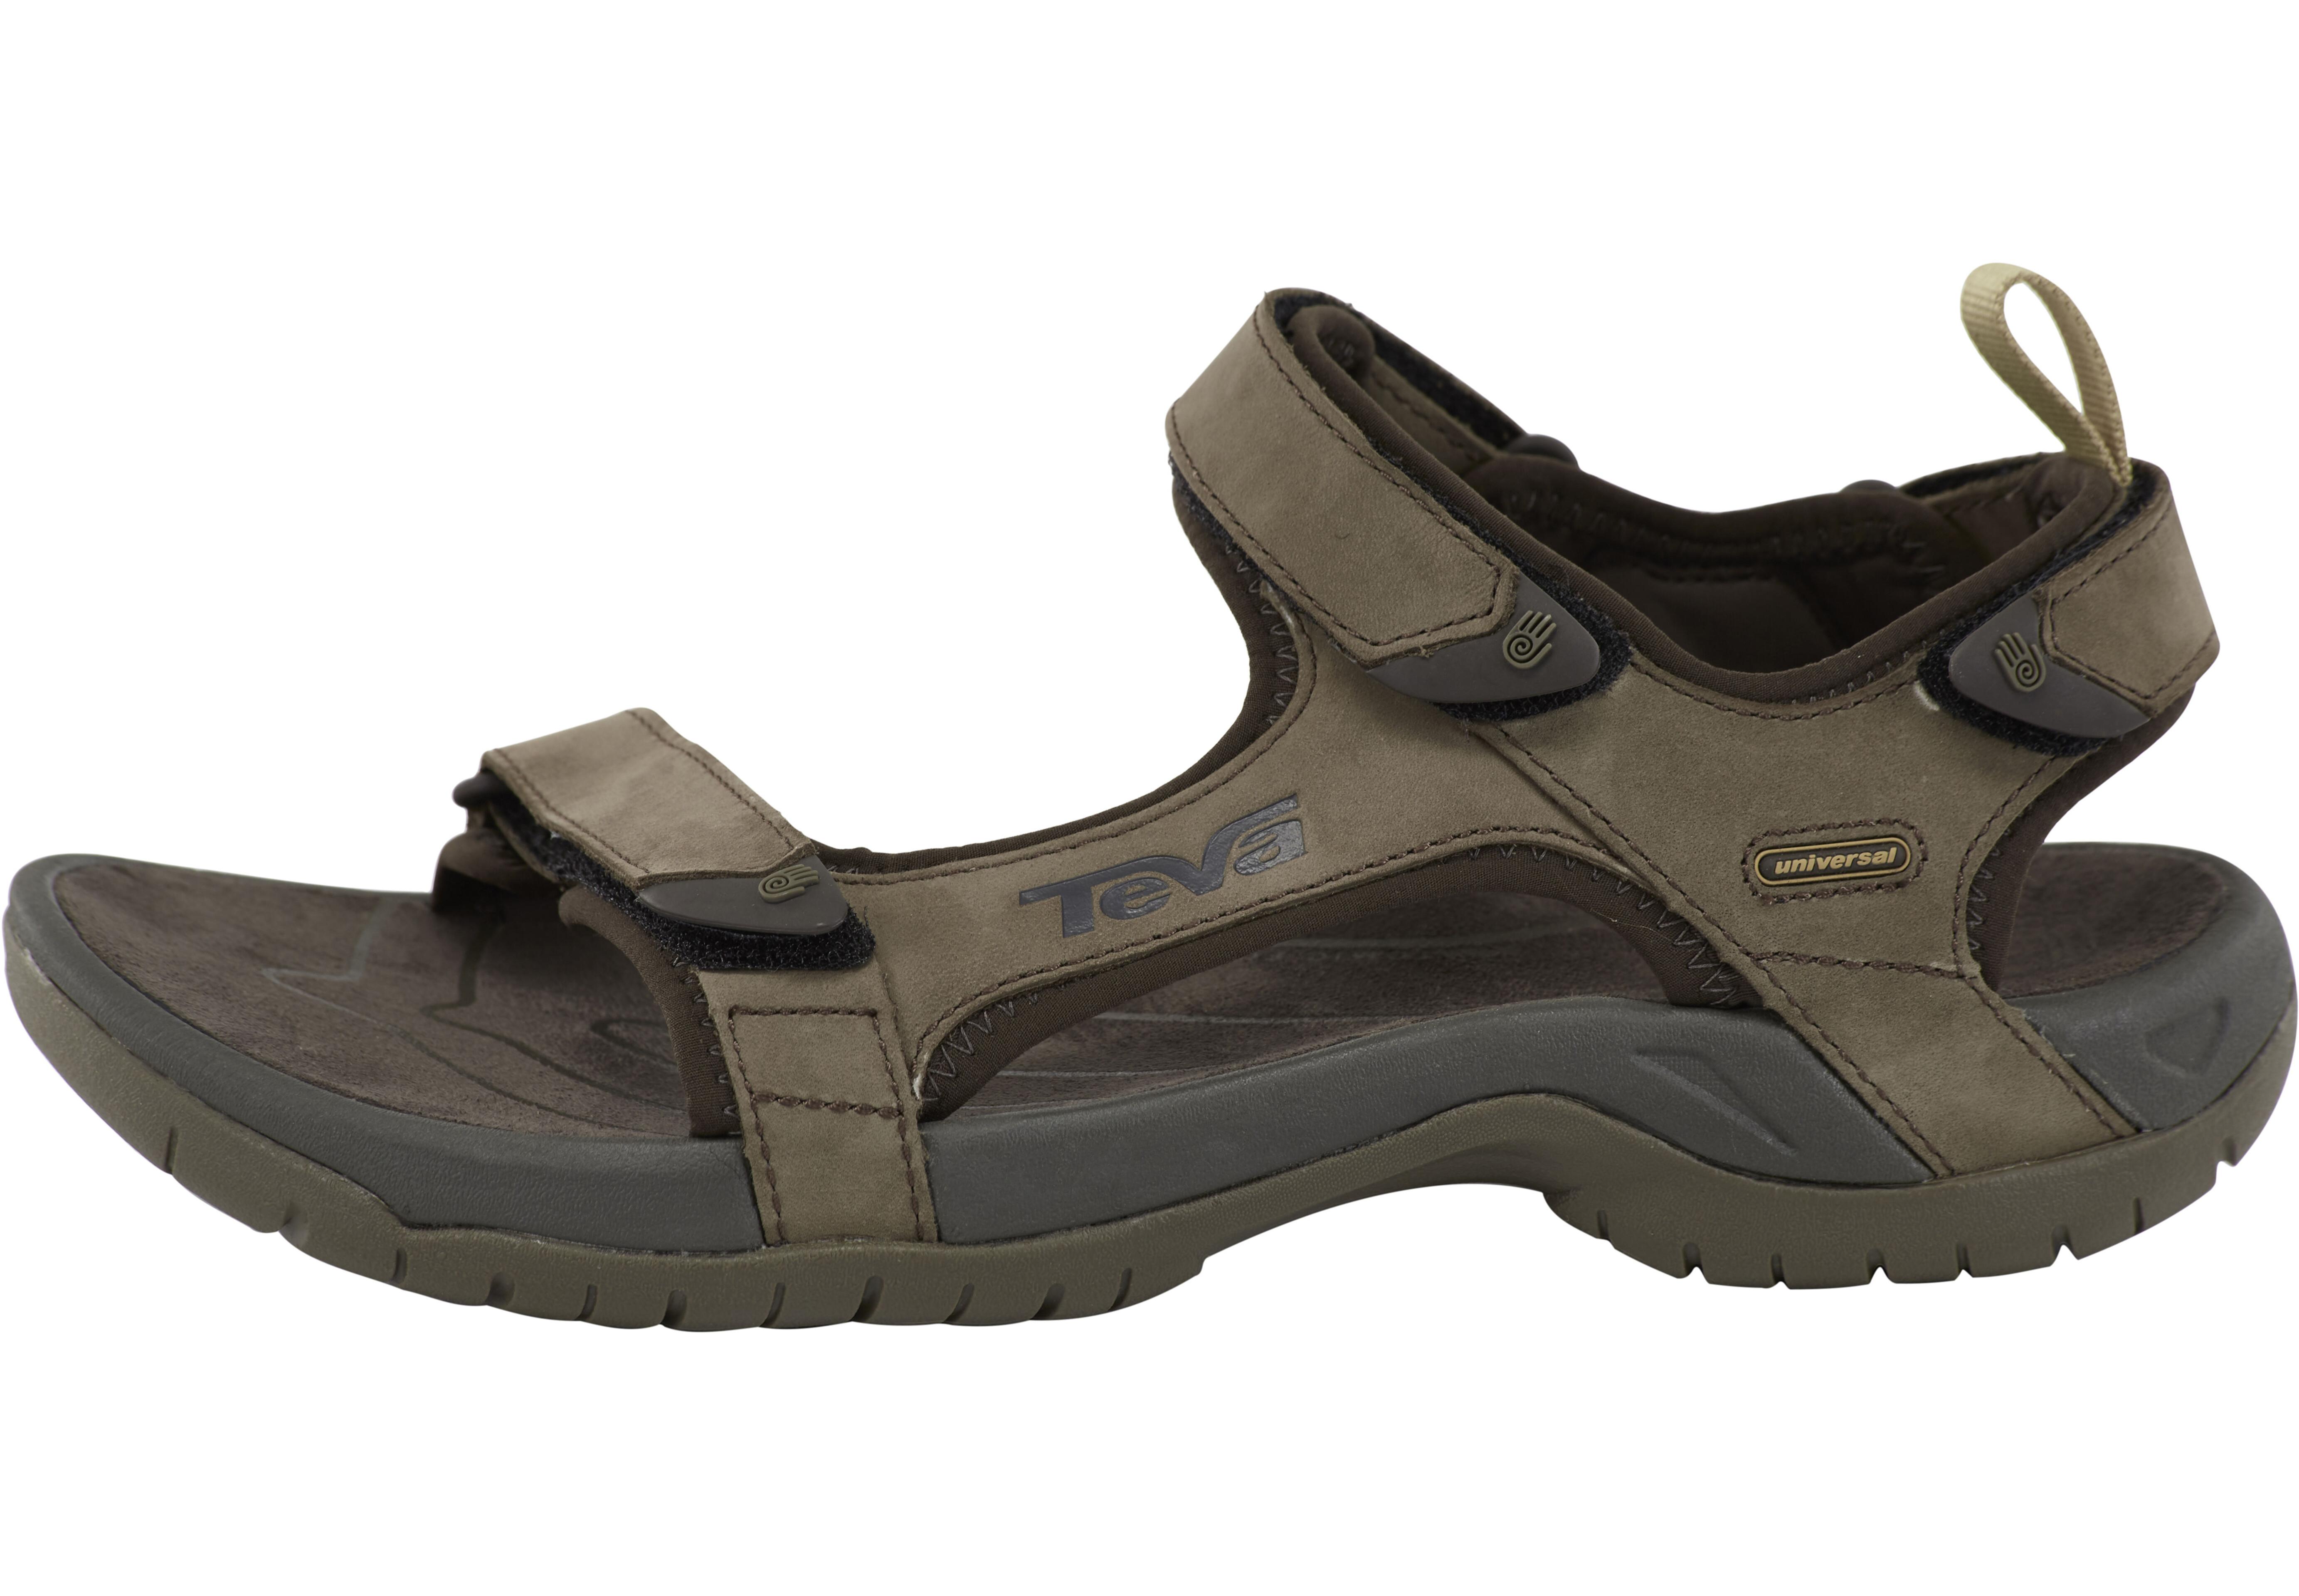 sports shoes 9ea35 4c9ee Teva Tanza Leather Sandals Men brown